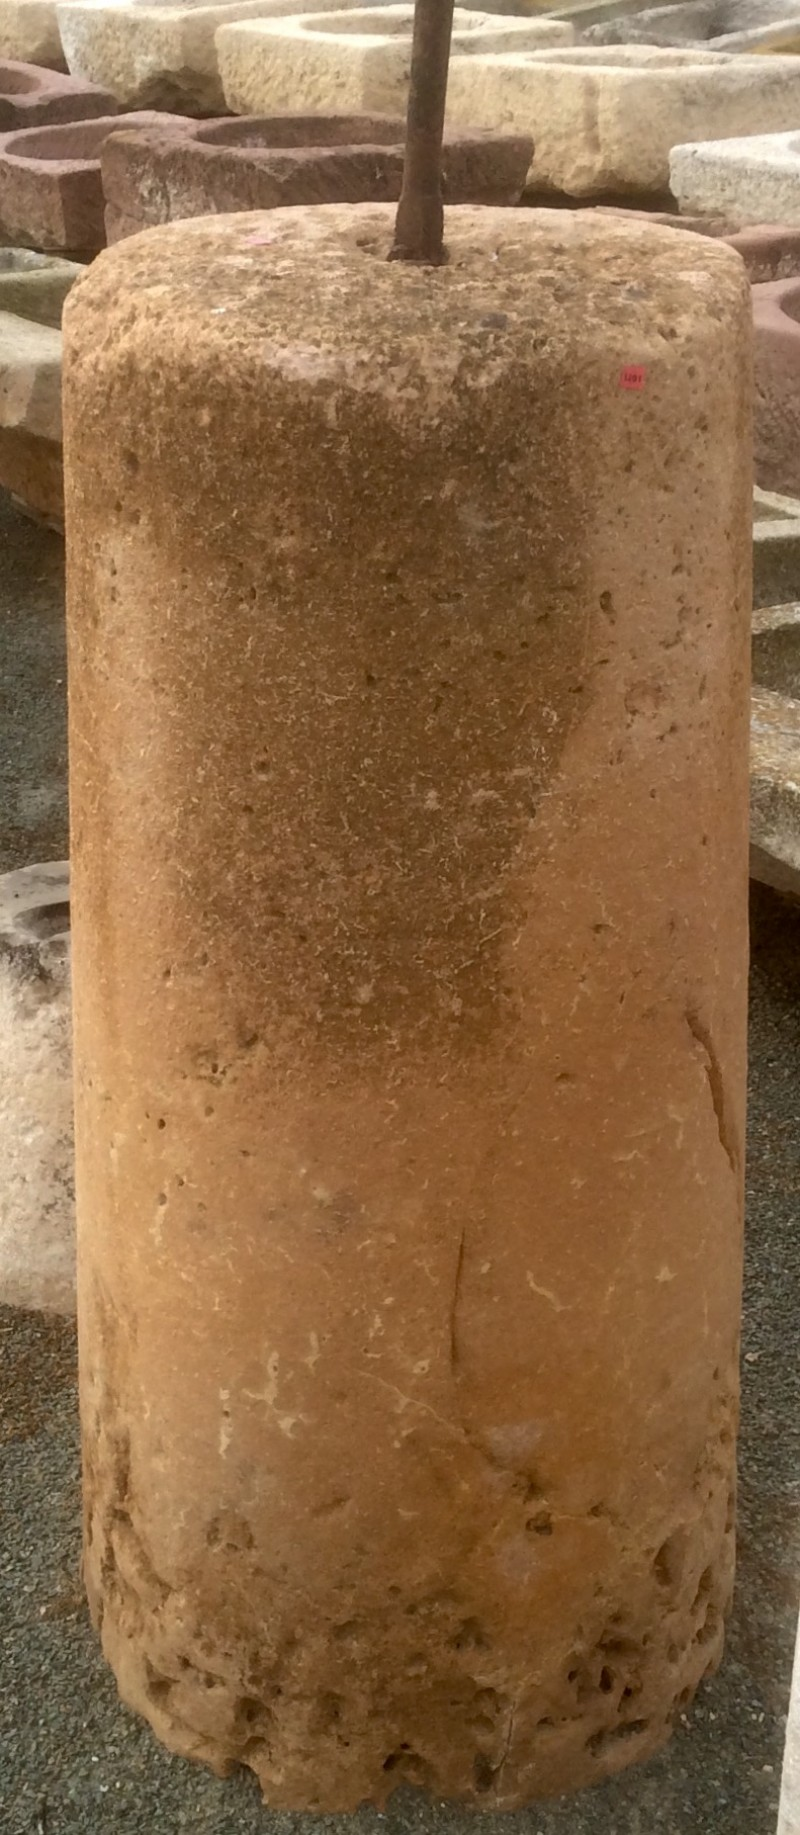 Rulo de piedra caliza. Mide 53 cm de diámetro x 1.07 cm de alto.